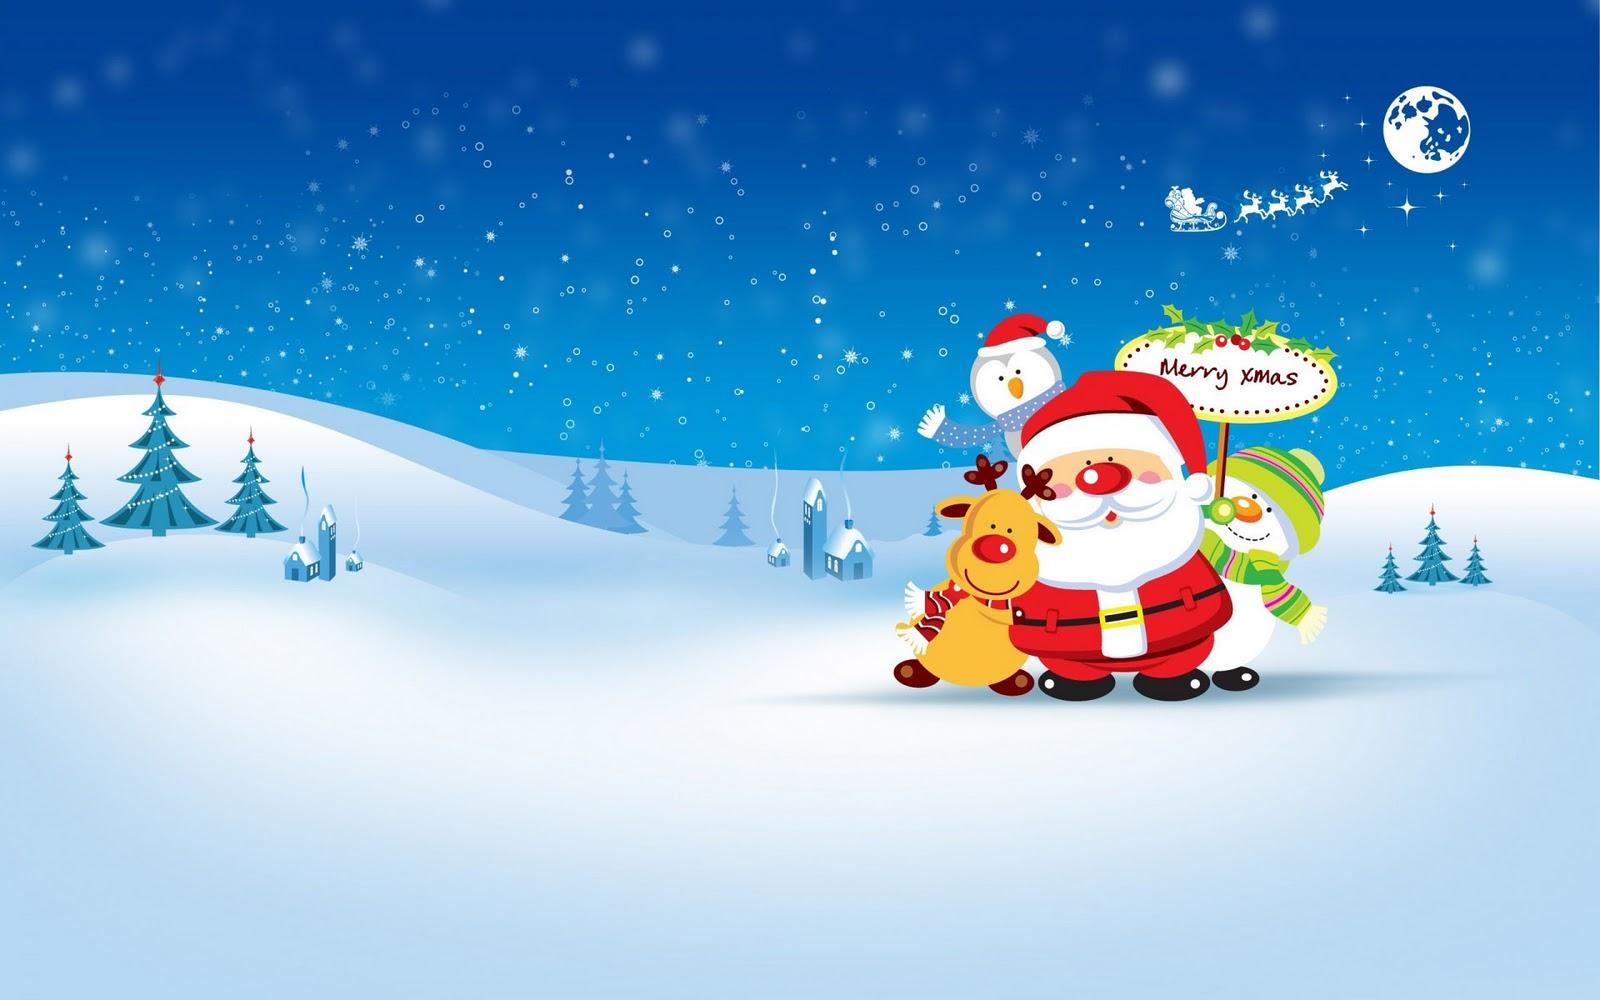 http://1.bp.blogspot.com/-RtWG3EnZbbs/Tq_Sx99MduI/AAAAAAAAP1o/hiouWmrDEm4/s1600/Mooie-kerstman-achtergronden-leuke-kerstman-wallpapers-afbeelding-plaatje-foto-9.jpg